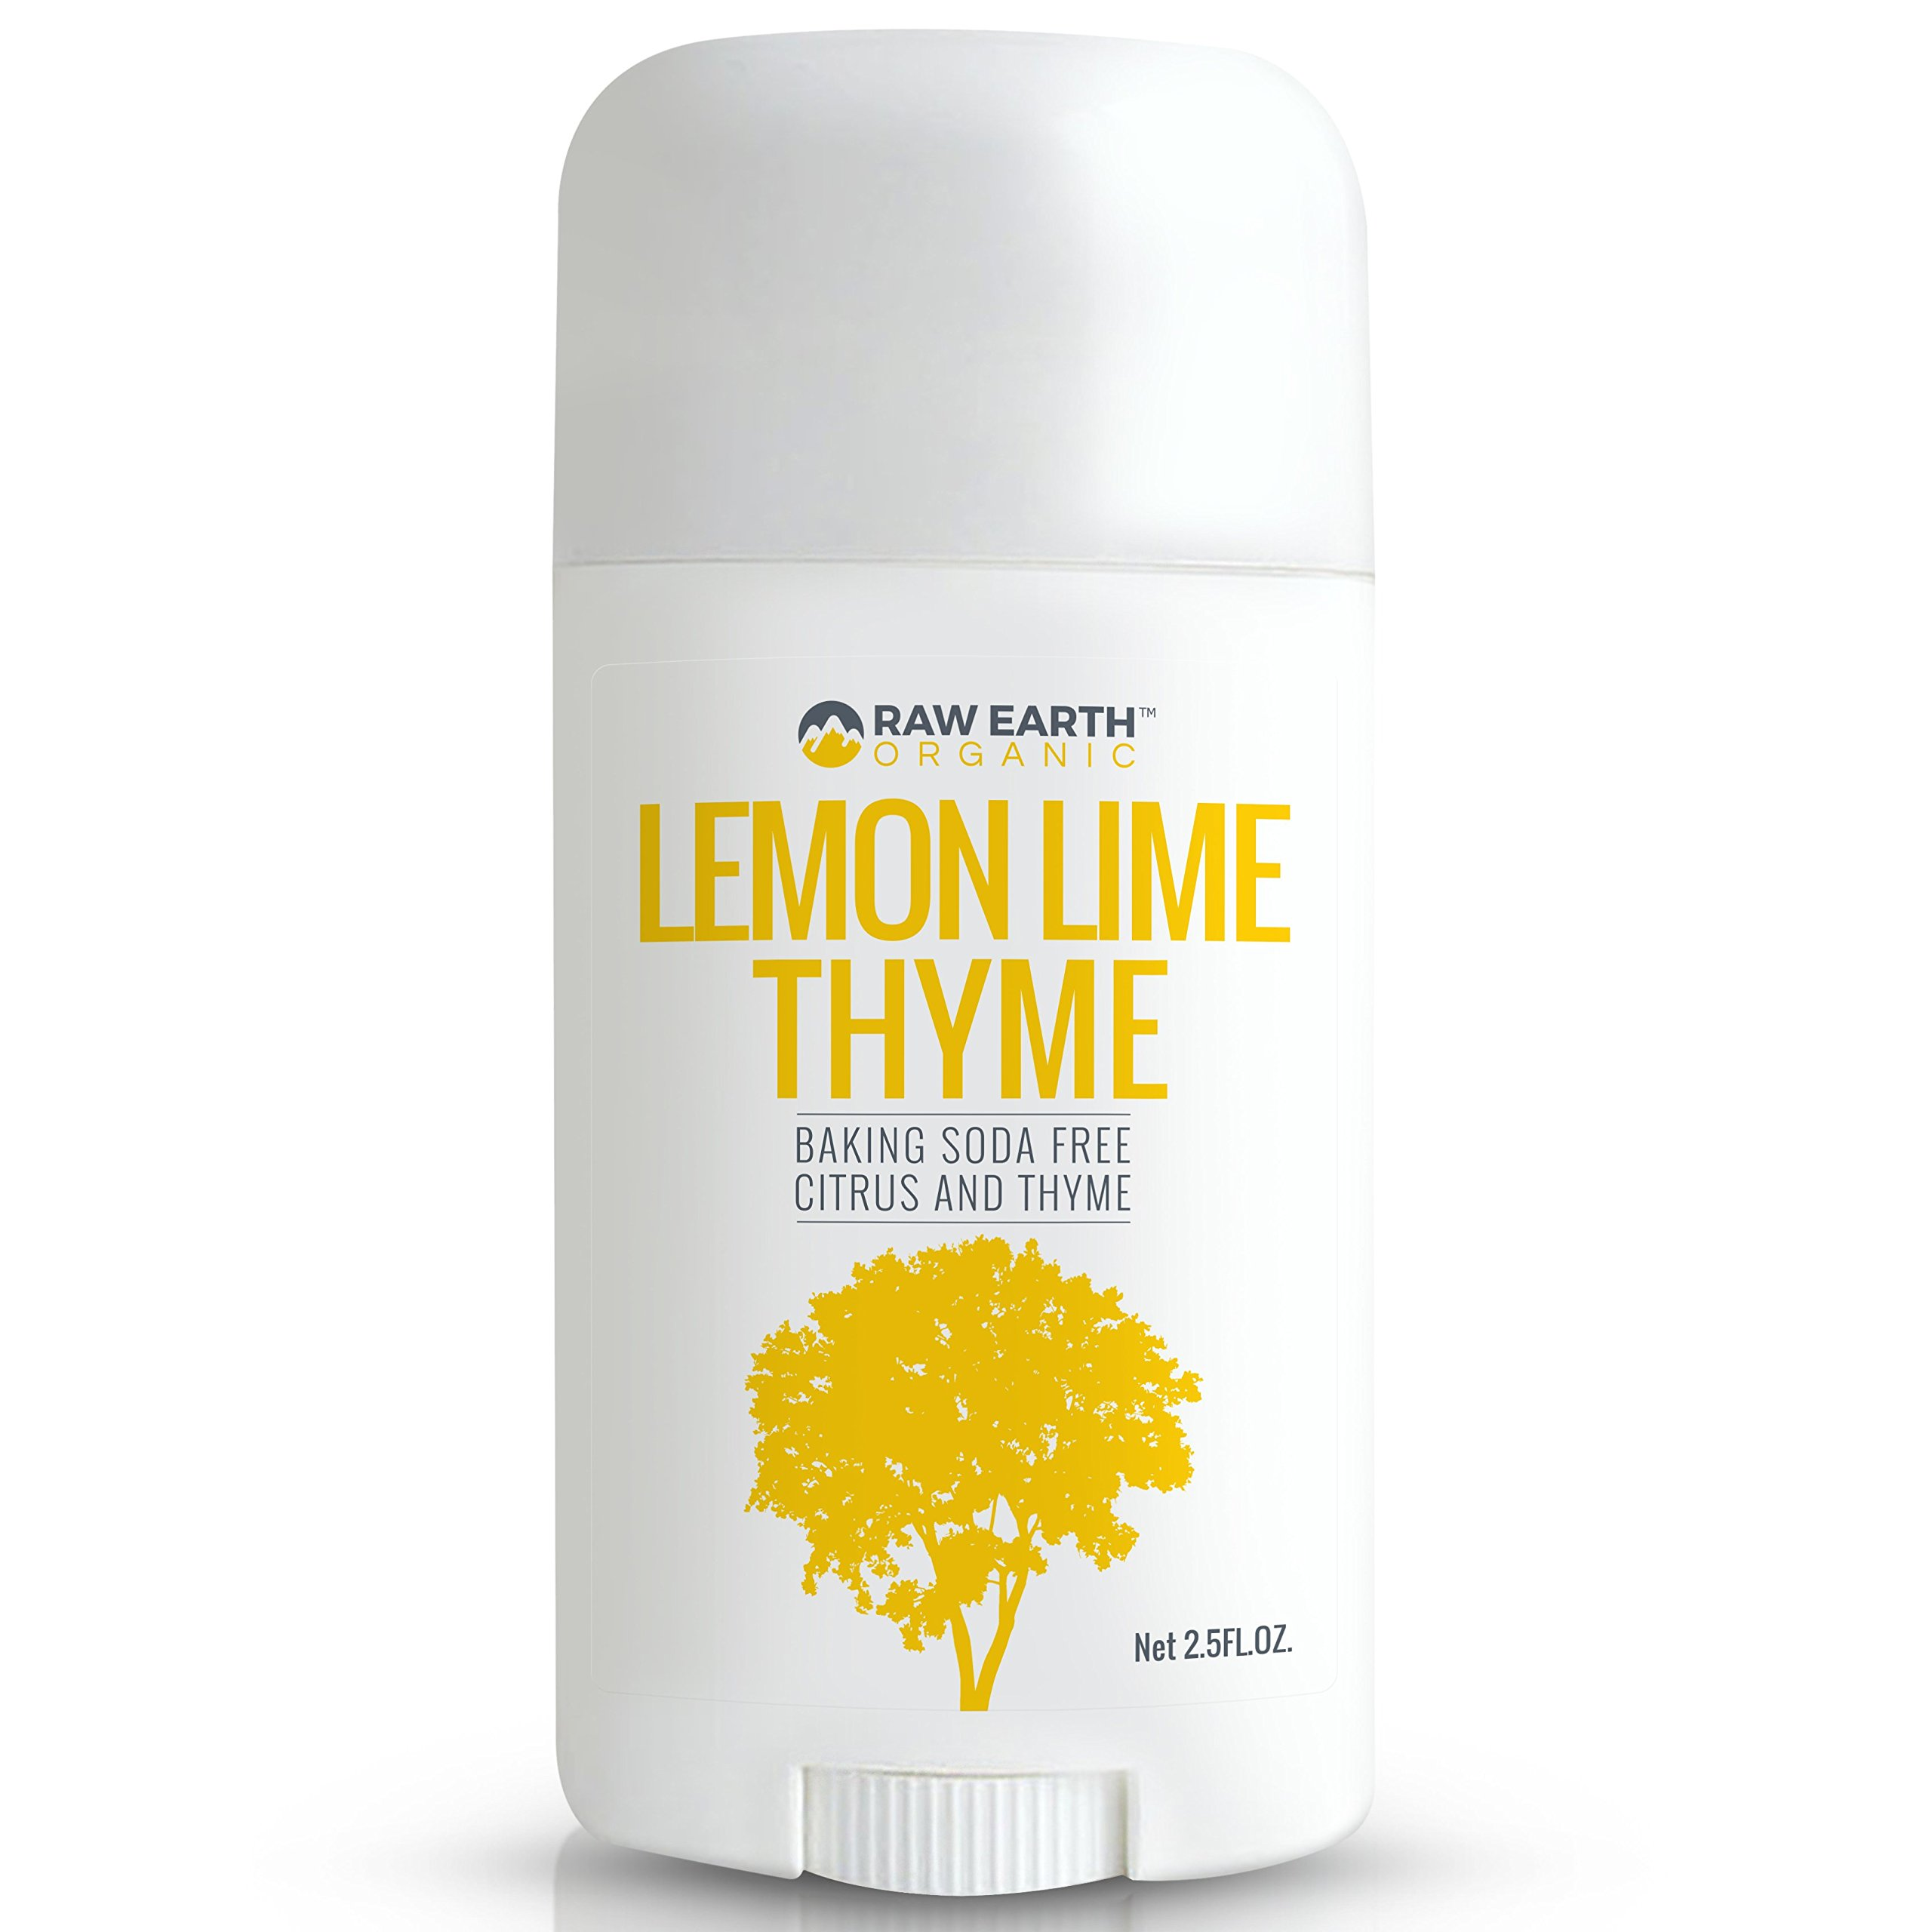 Raw Earth Organic All Natural Vegan Magnesium Deodorant - Baking Soda & Aluminum Free - Lemon / Lime / Thyme (2.5oz)